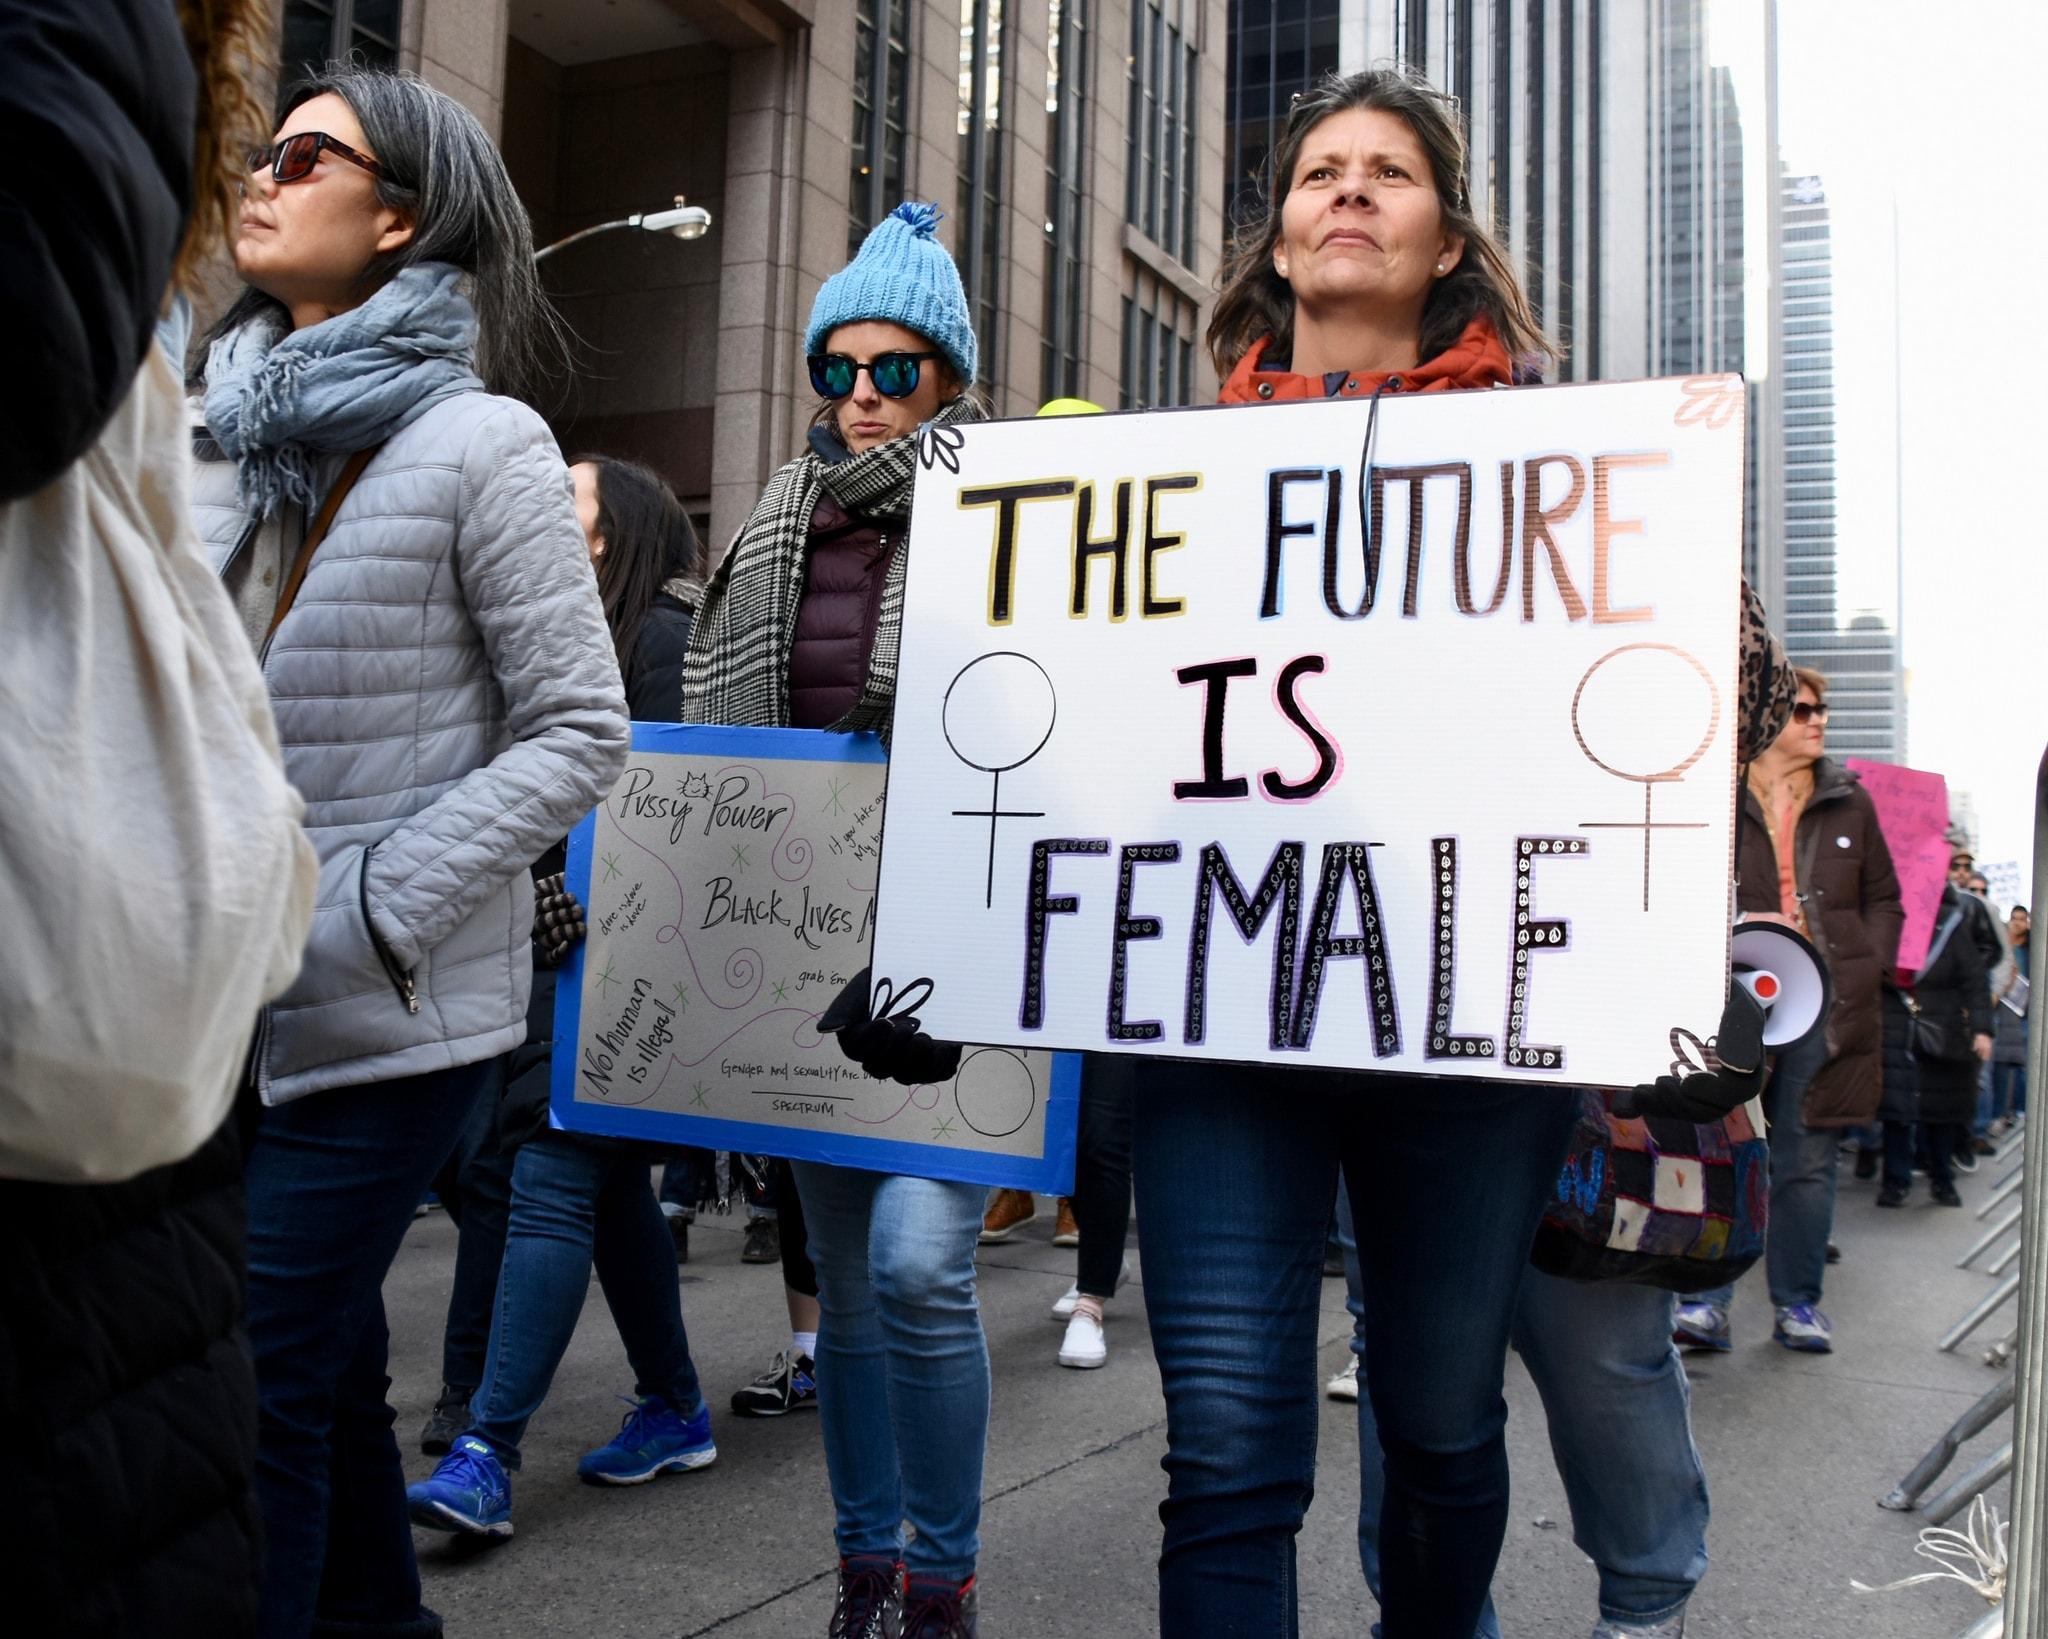 "A protester holds up a sign at the Women's March 2018 in NYC | <a href=""https://www.flickr.com/photos/alecperkins/28040475339/in/photolist-FwNcgb-E1Du82-23BSvfL-E1DtQi-23BSy2C-FwNbZE-23EF6G6-JHQMDM-JHQMVi-JHQN7a-22ieqUz-FwNcw1-23BStUj-23BSymA-23BSxxG-JHQNgt-JHQLpn-JHQLia-FwNbyE-23BSvnj-23BSu5E-E1Dvrp-23BSyXq-23BSvPw-E1DupV-JHQMMH-23BSwQ9-23BSvrs-23BStvo-E1Dv8P-23BStjw-JHQLtF-22ierbM-JHQMaR-23EF6wr-23BSuPW-23BStNh-23BSuGG-22ieqMk-E1DuZH-23BSue7-JHQLB6-22ier2P-JHQMrc-FwNbMA-23BSyhh-E1DvQF-23BSwj9-22ieqJp-23BSAXh"" target=""_blank"" rel=""noopener"">© Alec Perkins/Flickr</a>"